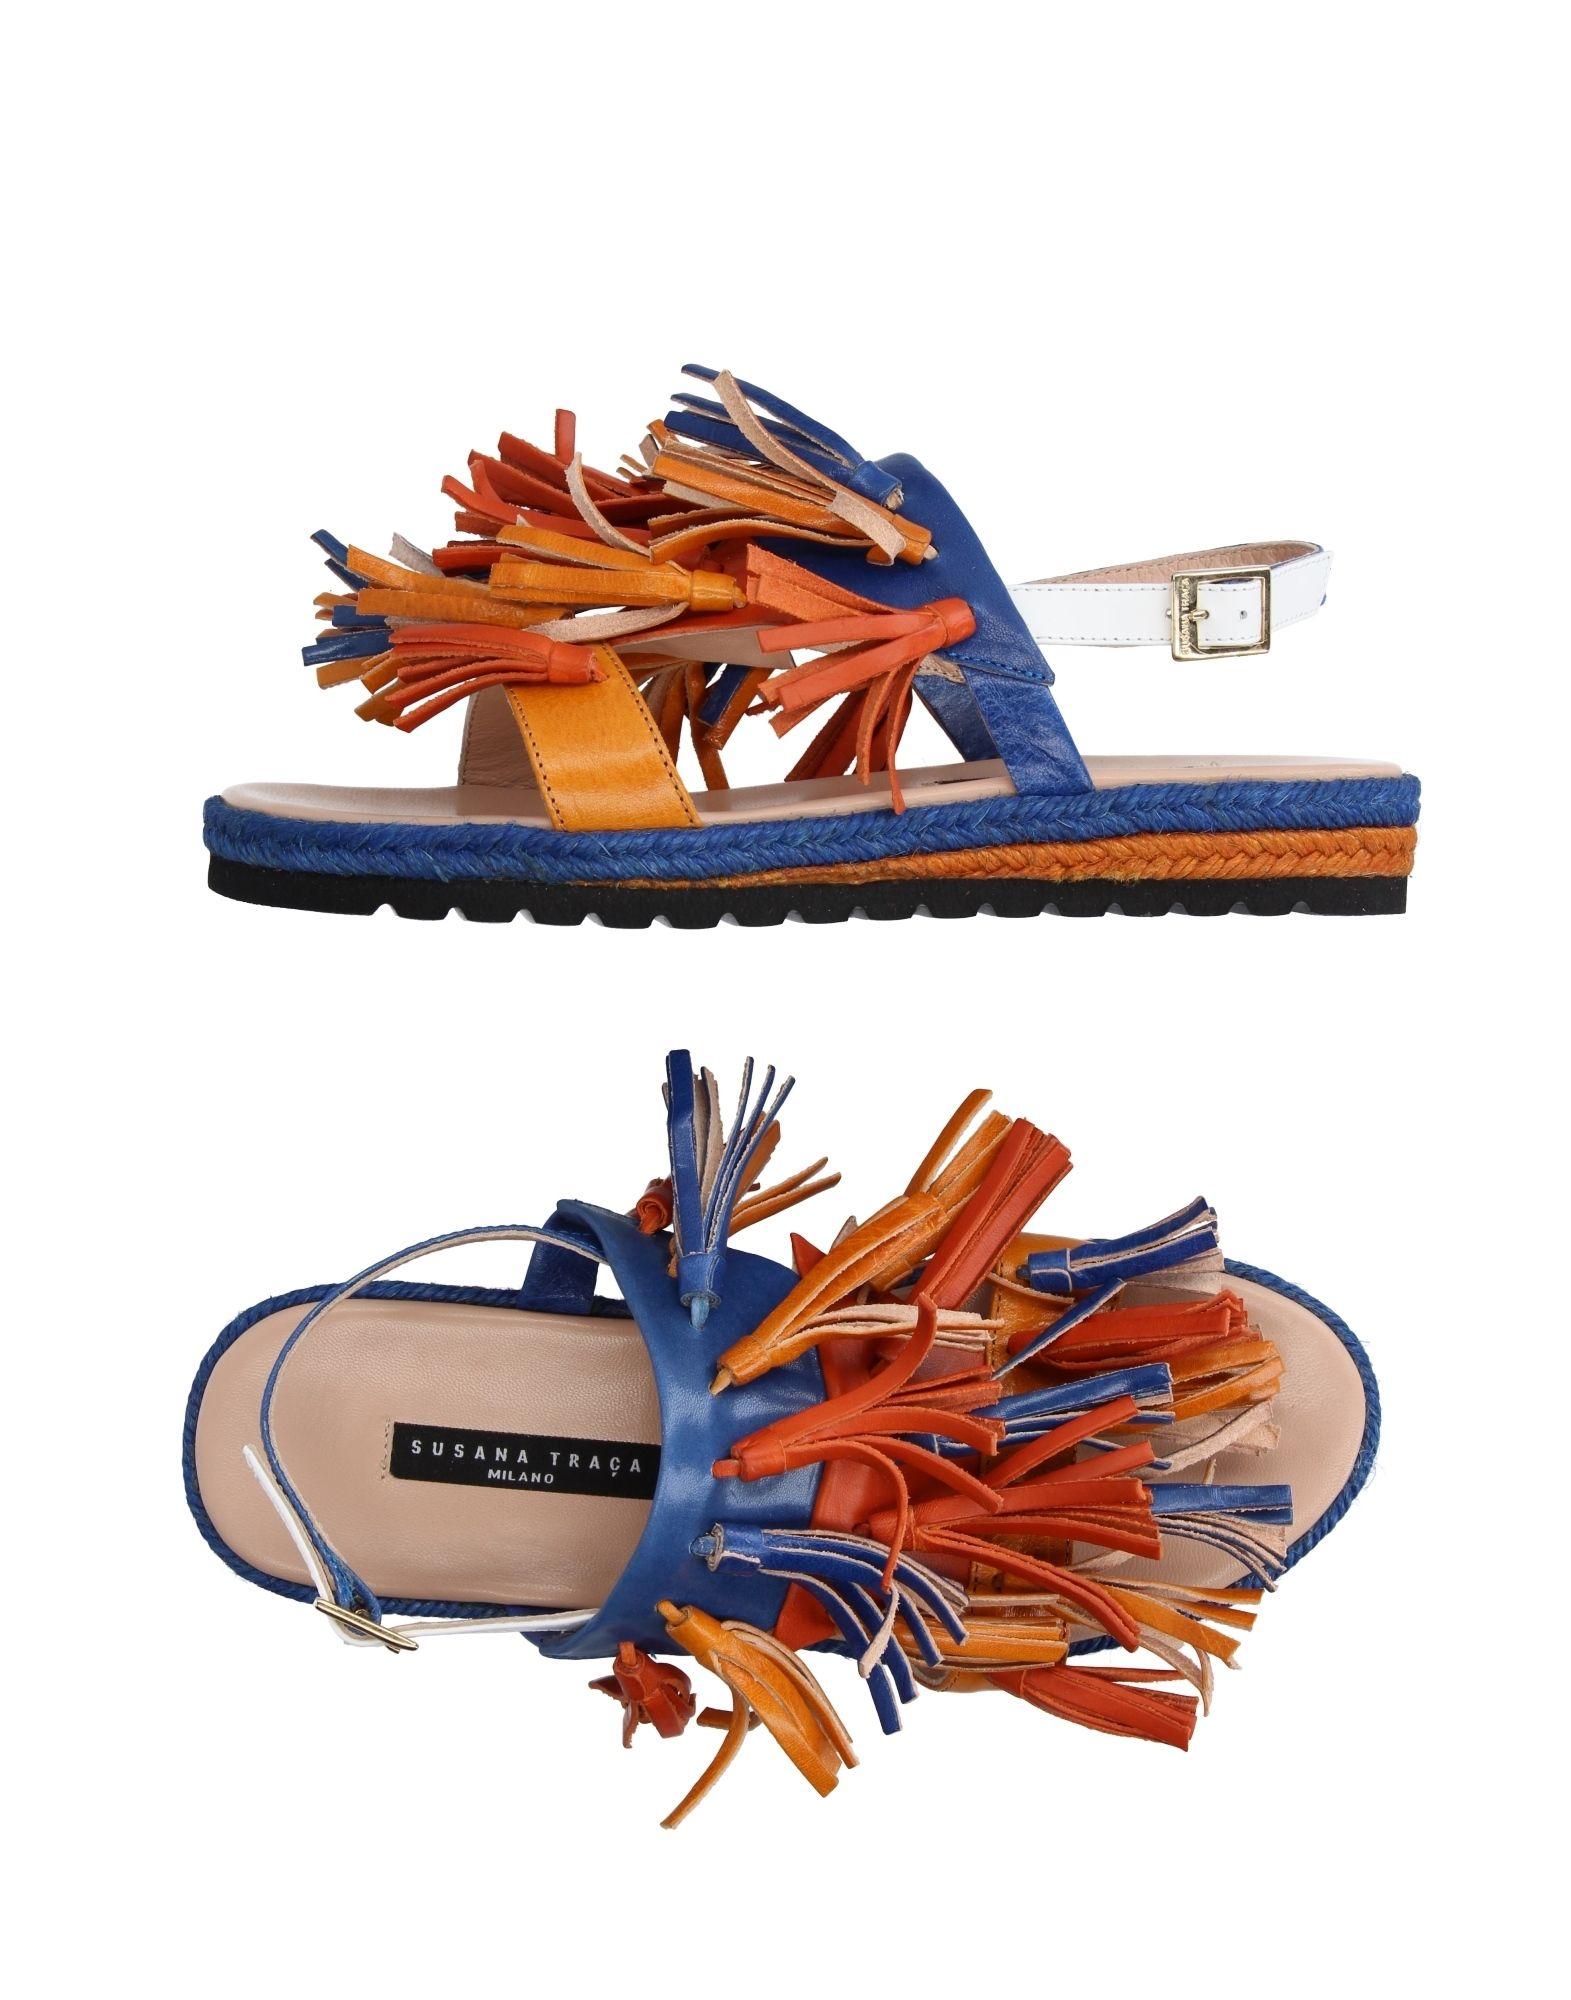 Gut um Espadrilles billige Schuhe zu tragenSusana Traca Espadrilles um Damen  11215214TO 9f73b2